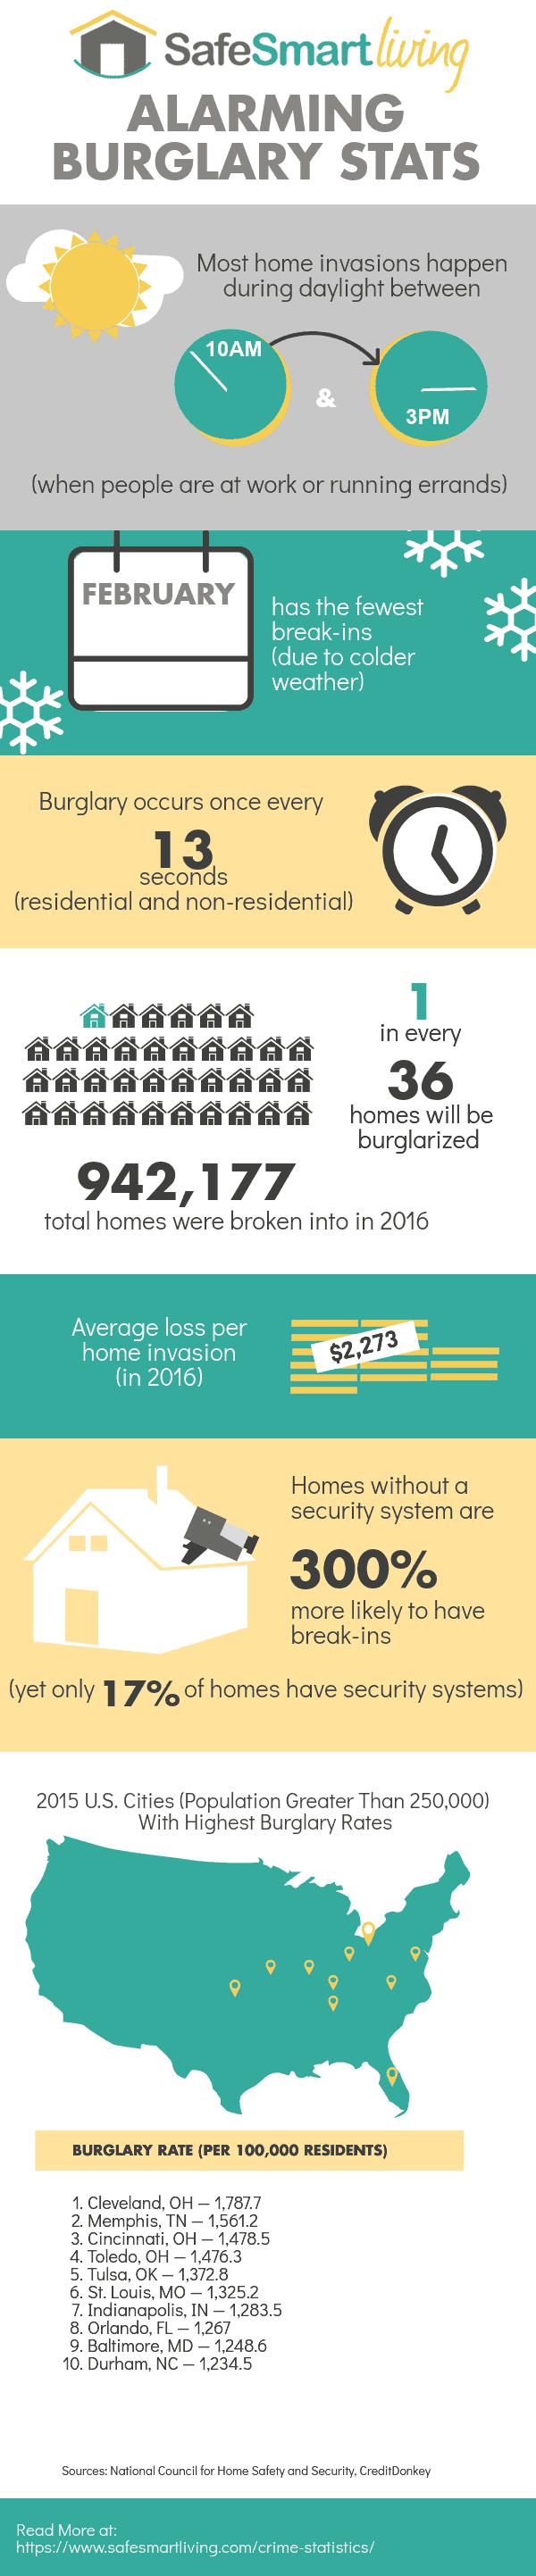 Home Burglary Statistics